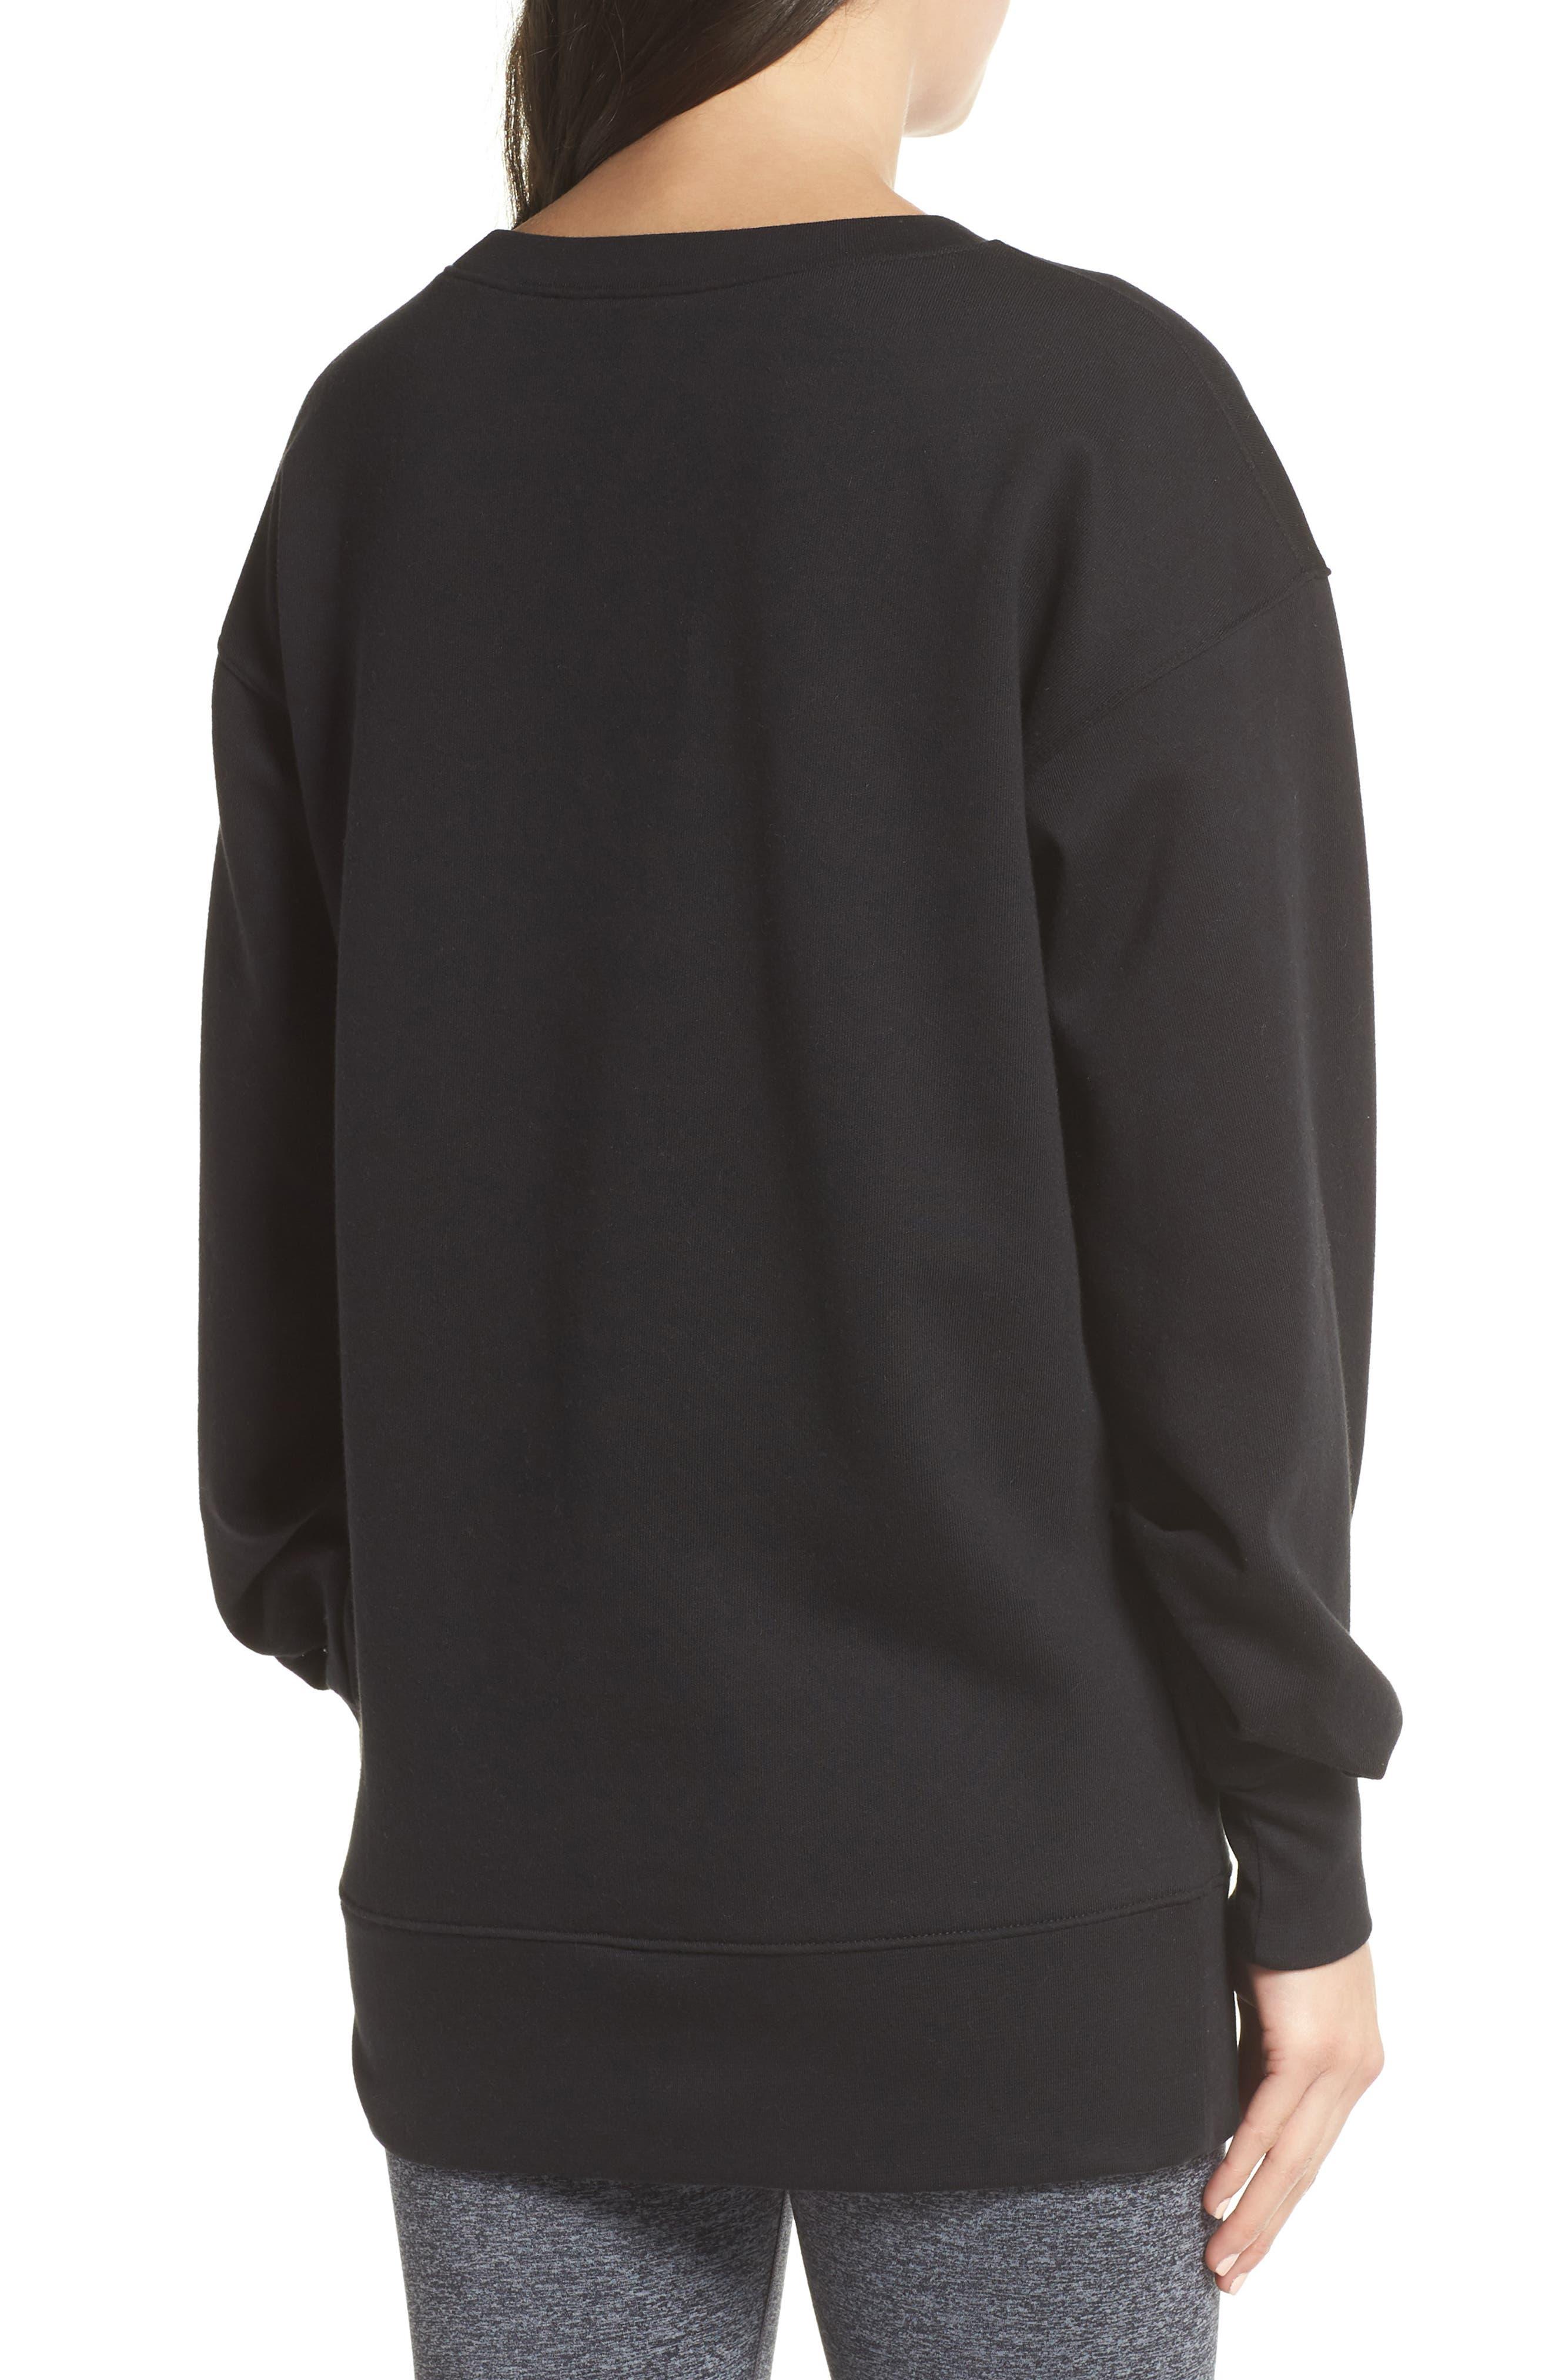 ZELLA,                             Boxy Oversize Sweatshirt,                             Alternate thumbnail 2, color,                             001